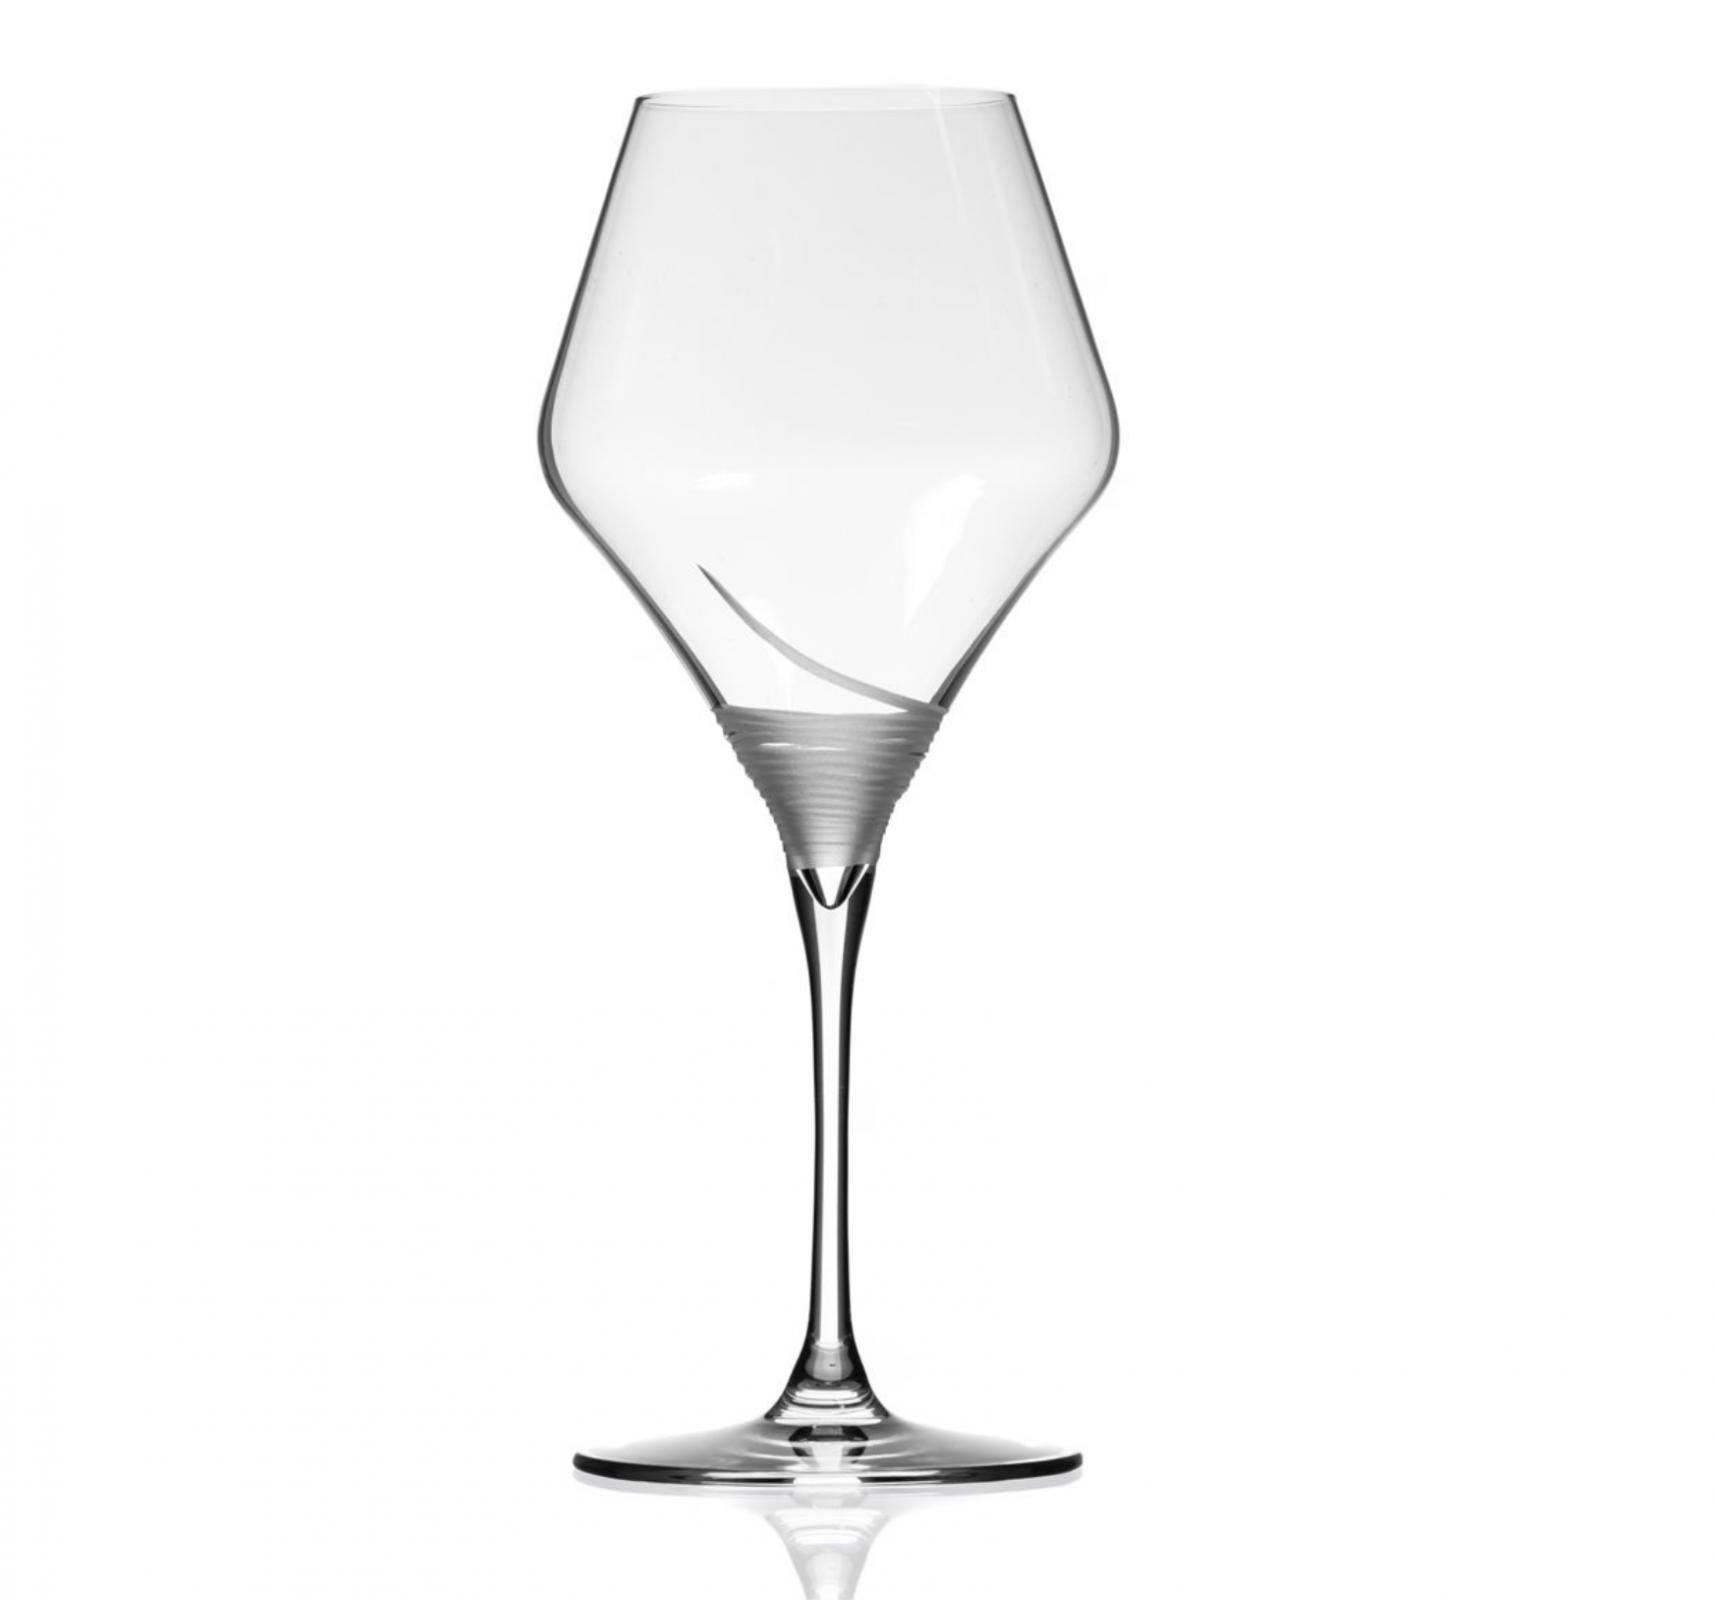 Rolf Mid Century Winetini Glass 17oz